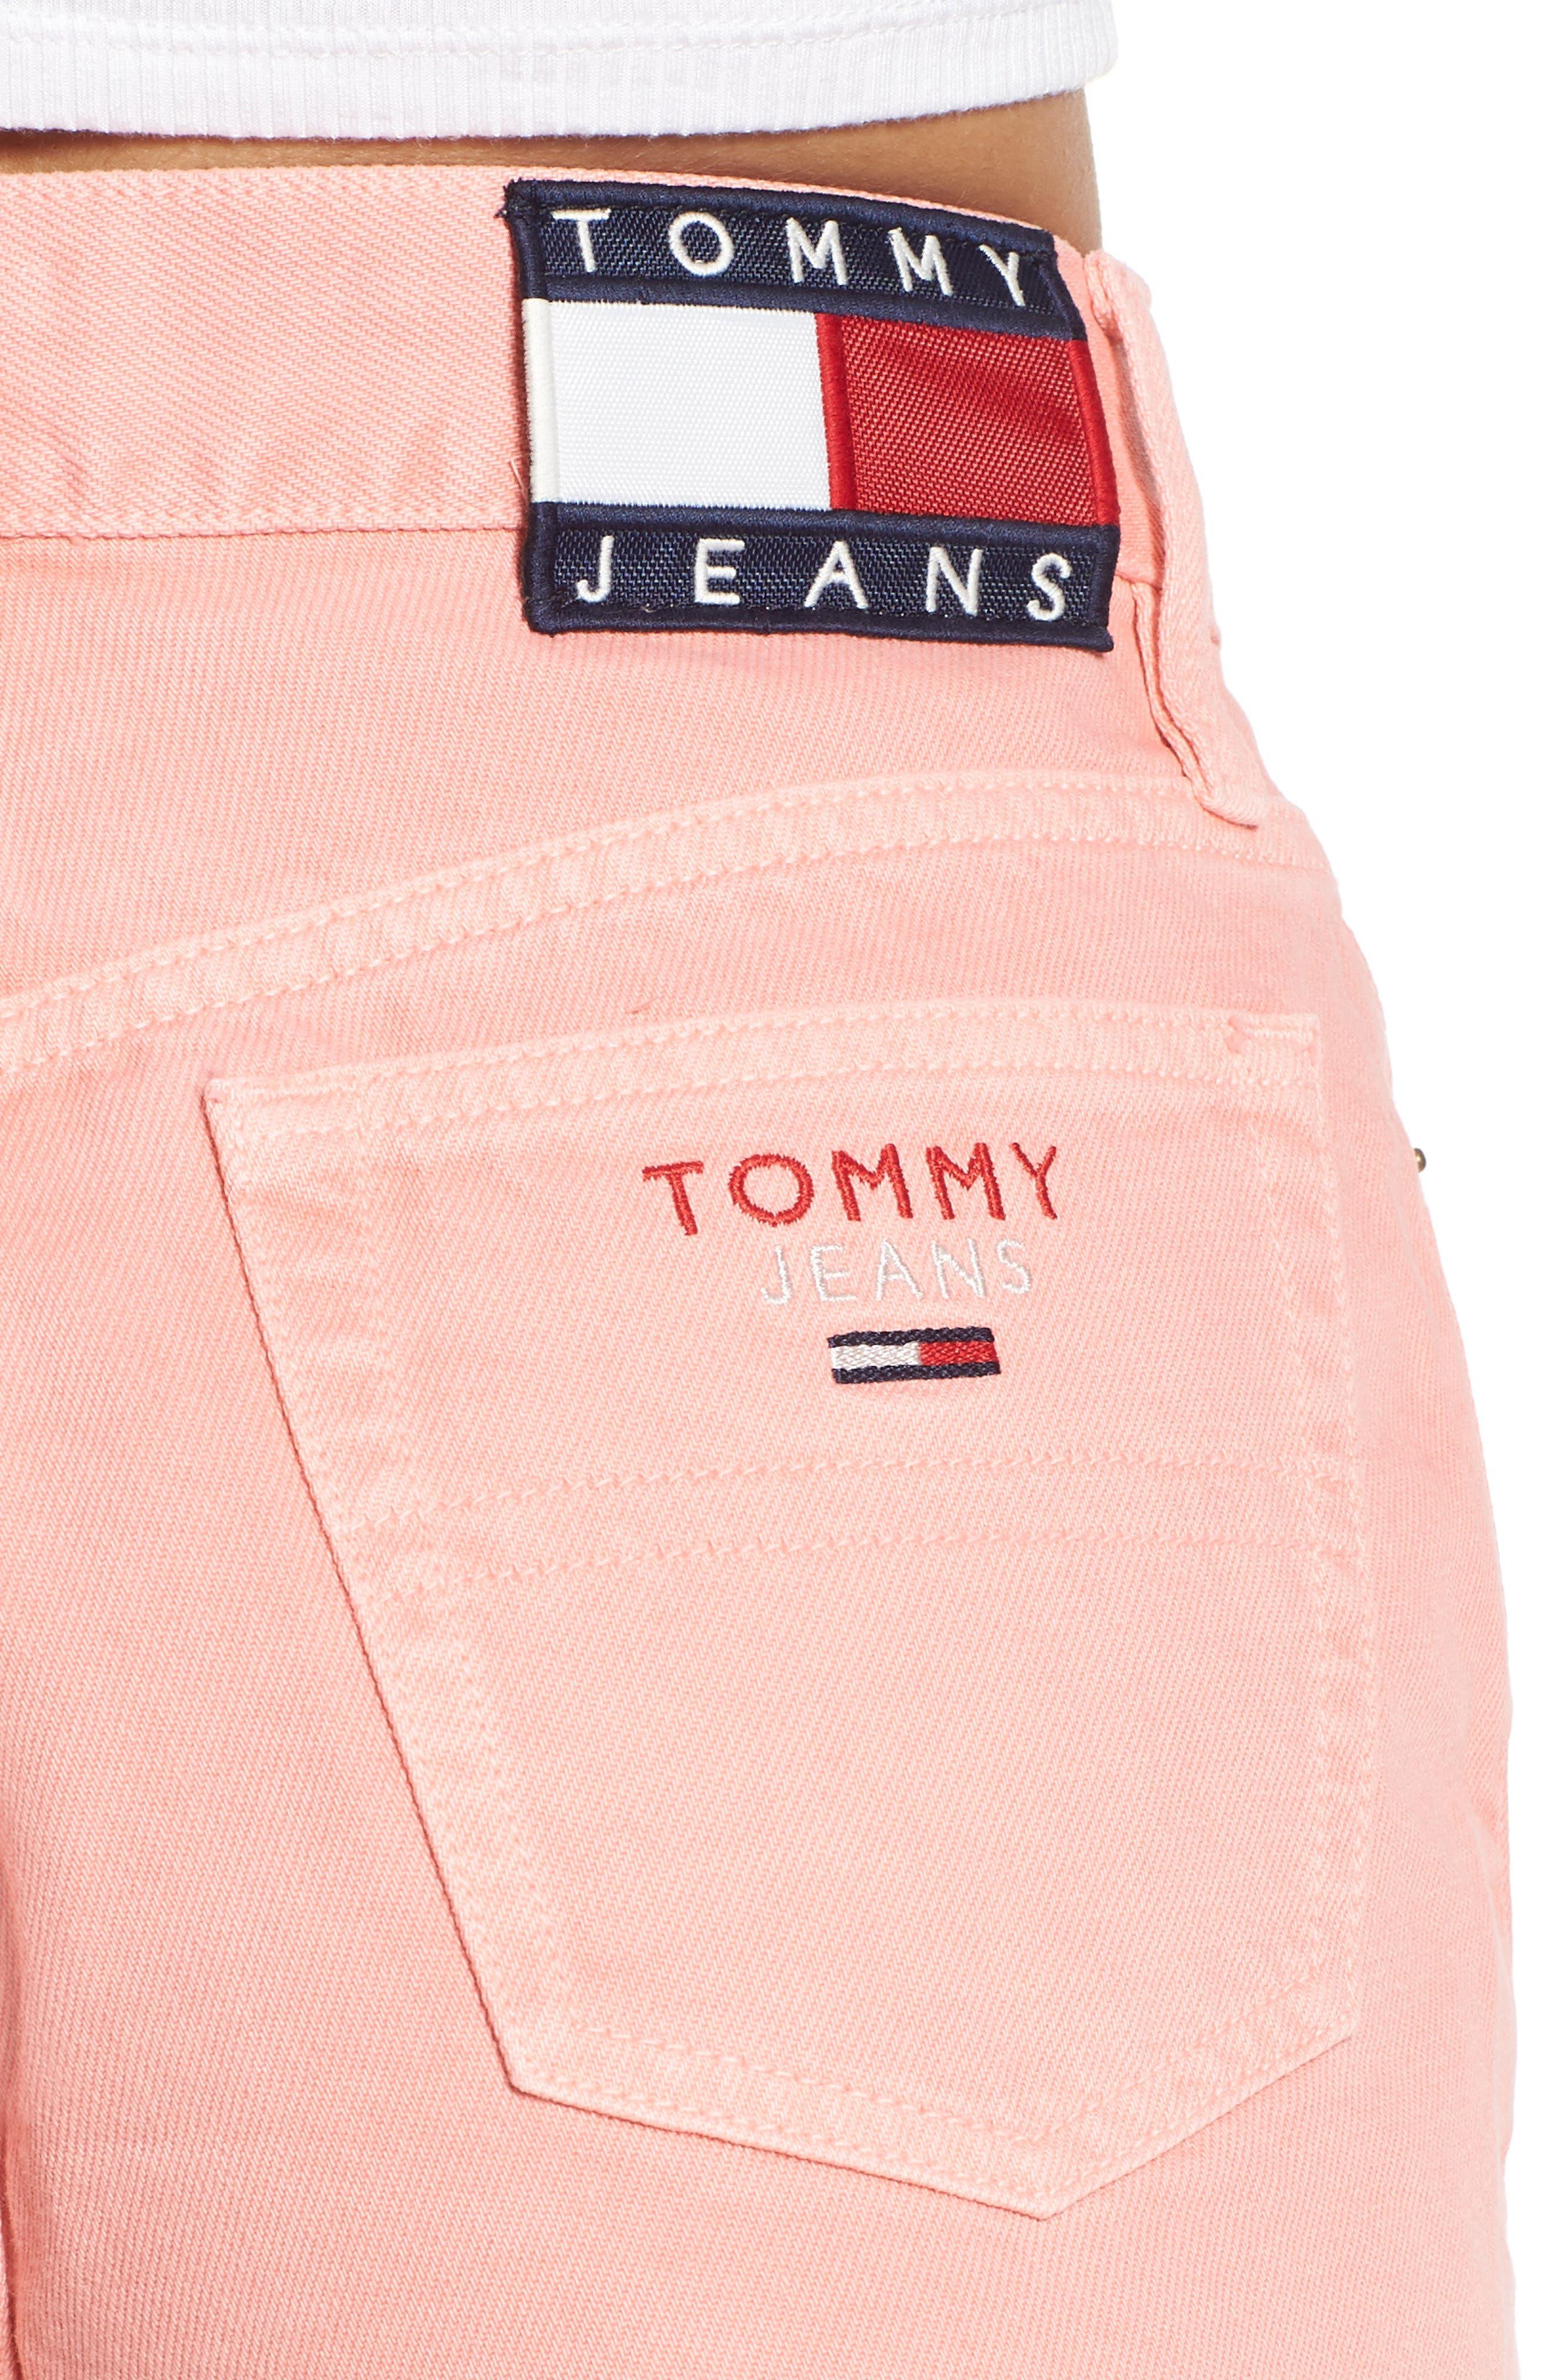 TOMMY JEANS,                             Fray Hem Denim Shorts,                             Alternate thumbnail 4, color,                             667